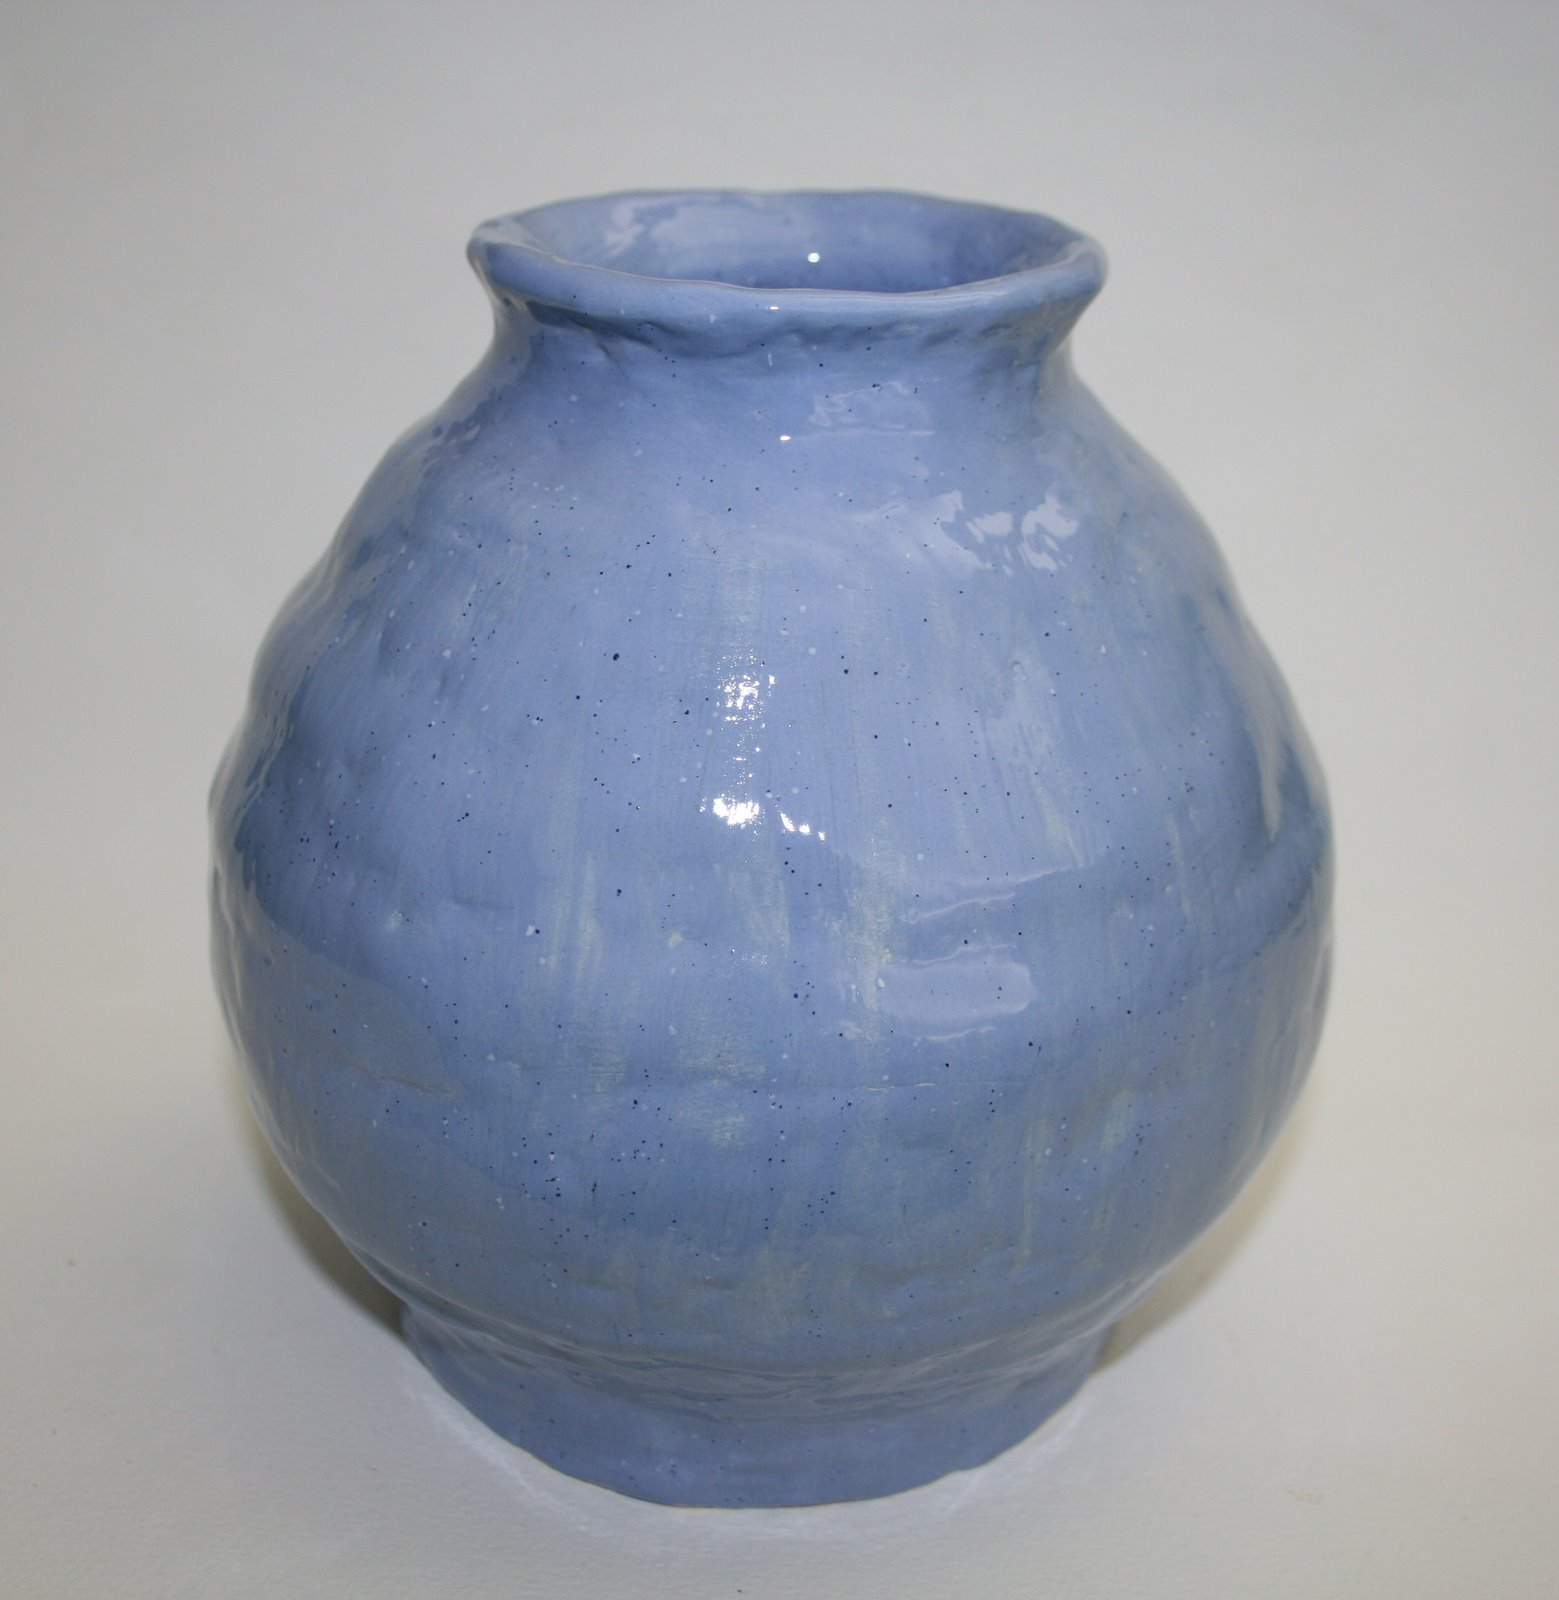 BHS Art Gallery: Ceramics - Coil Pots